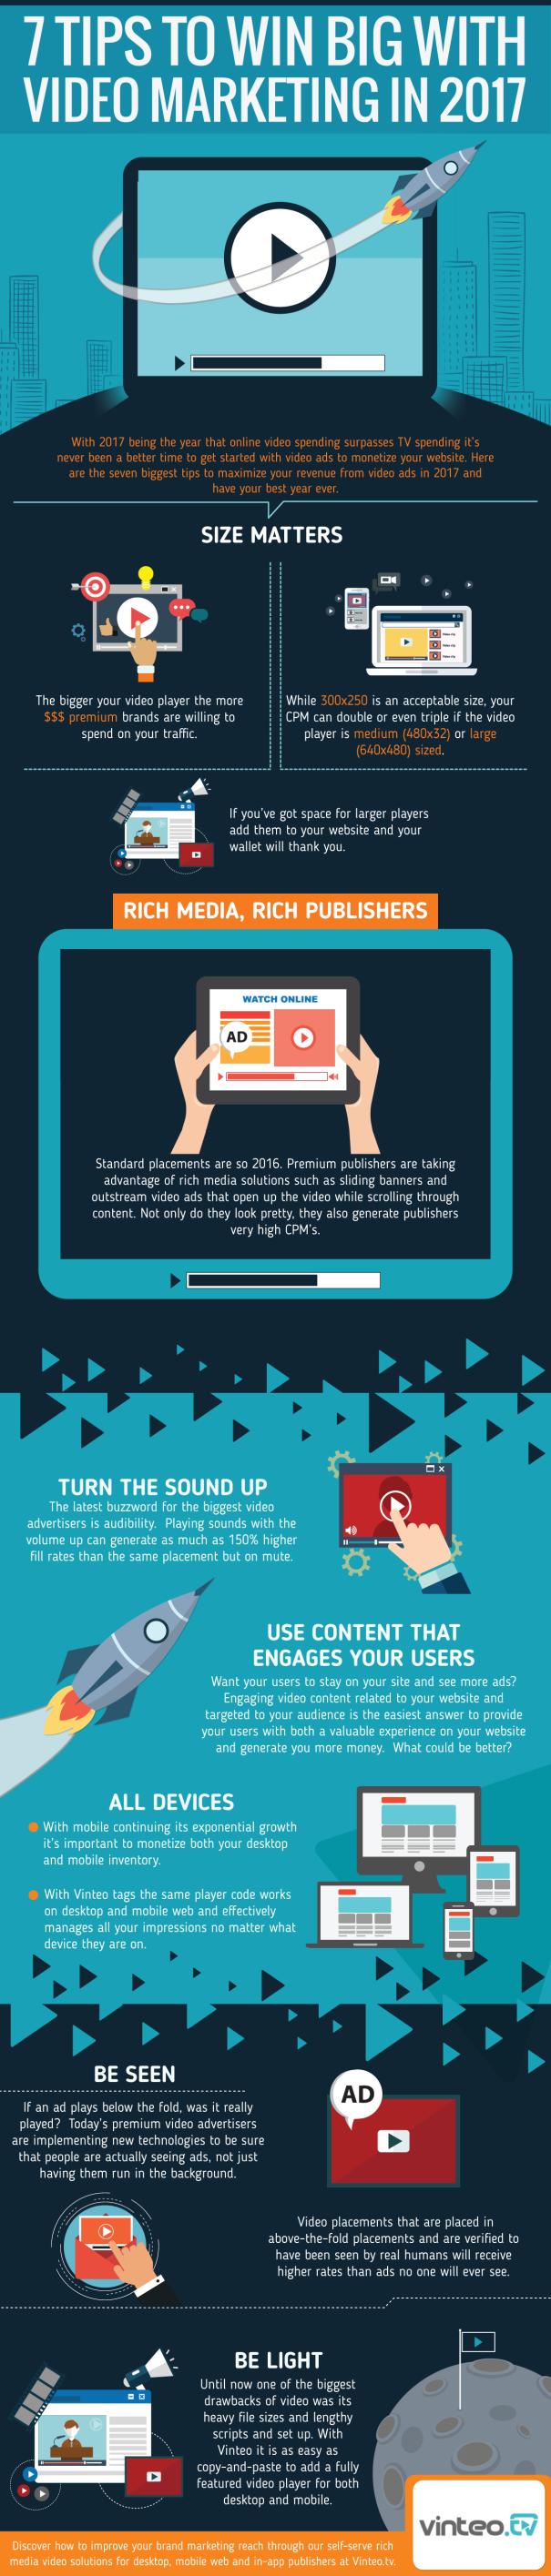 vinteo-infographic.png